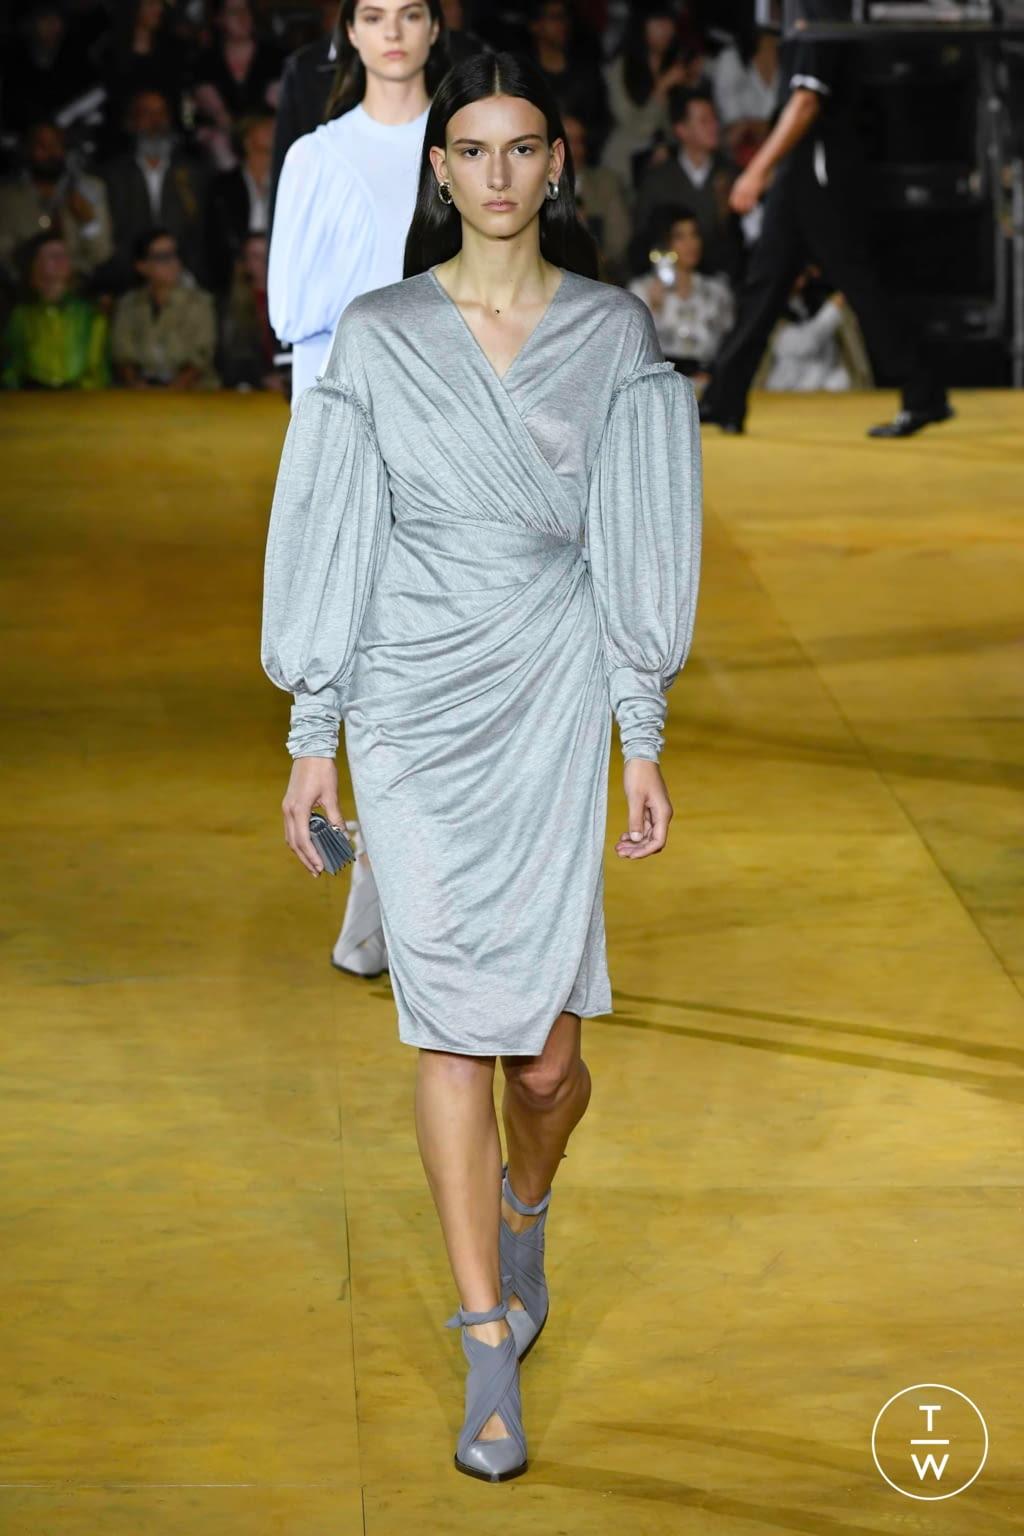 vestido drapeado london fashion week ss20